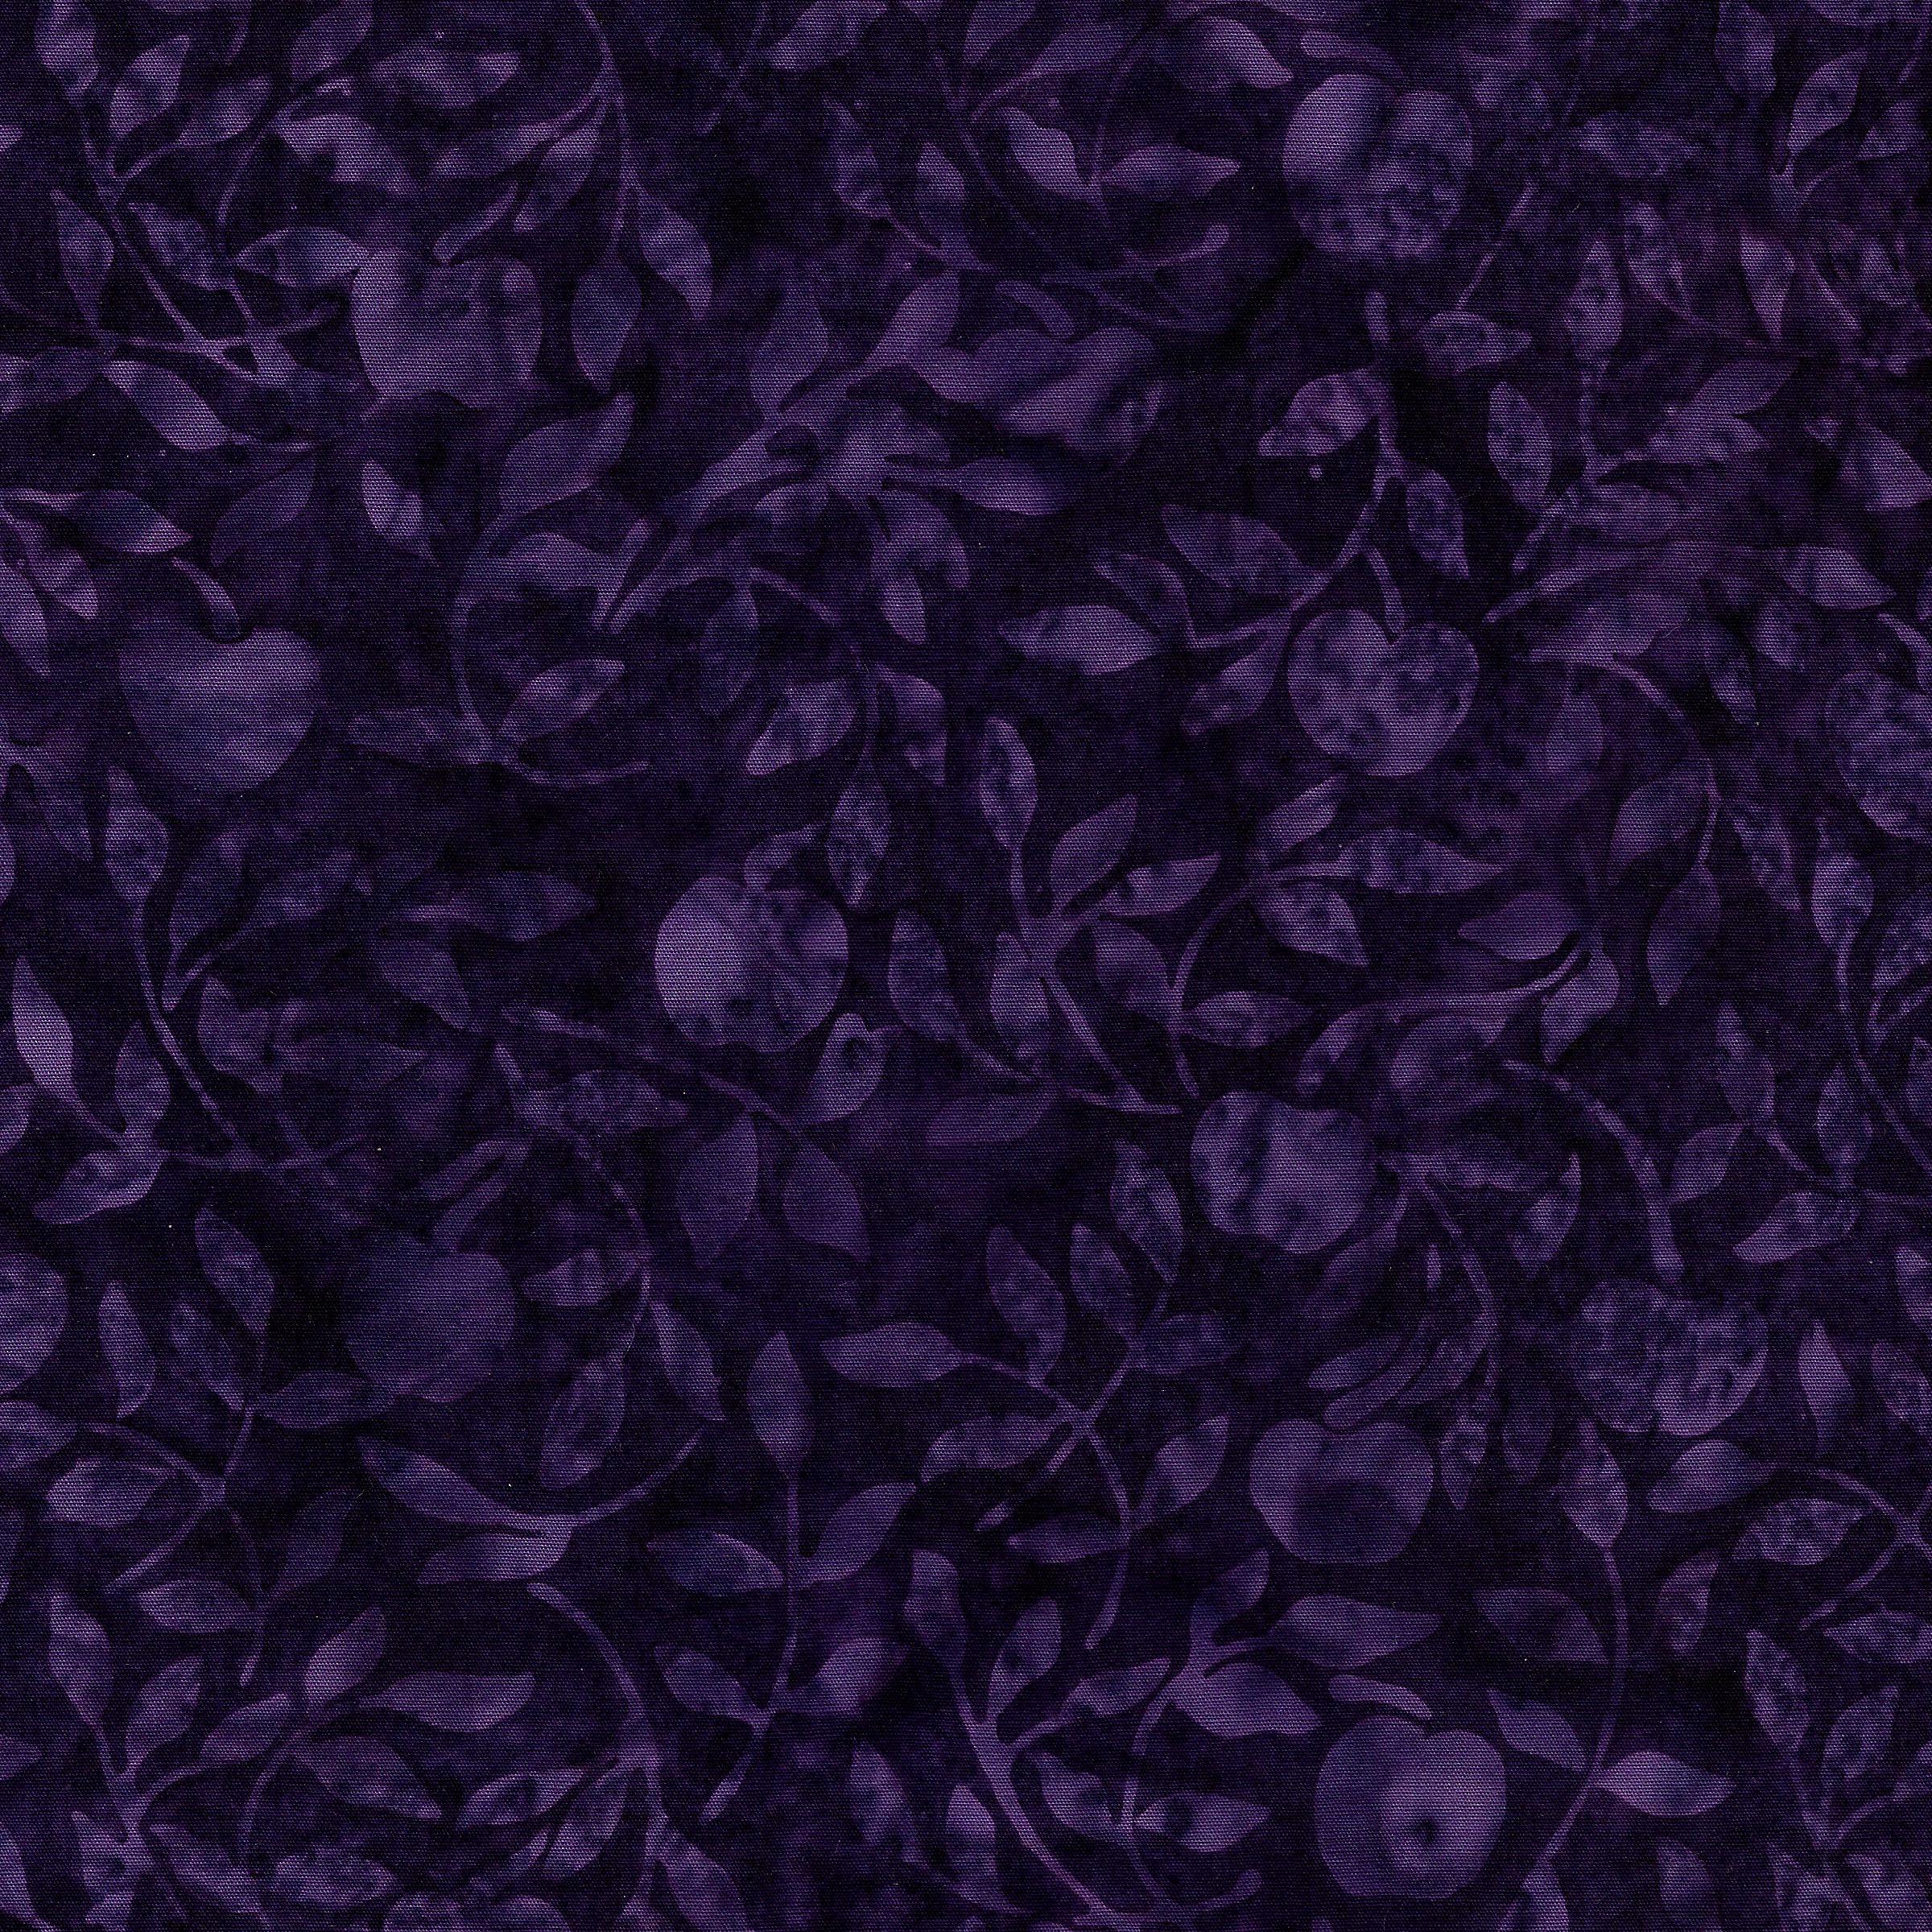 Cherries-Blackberry 111925485